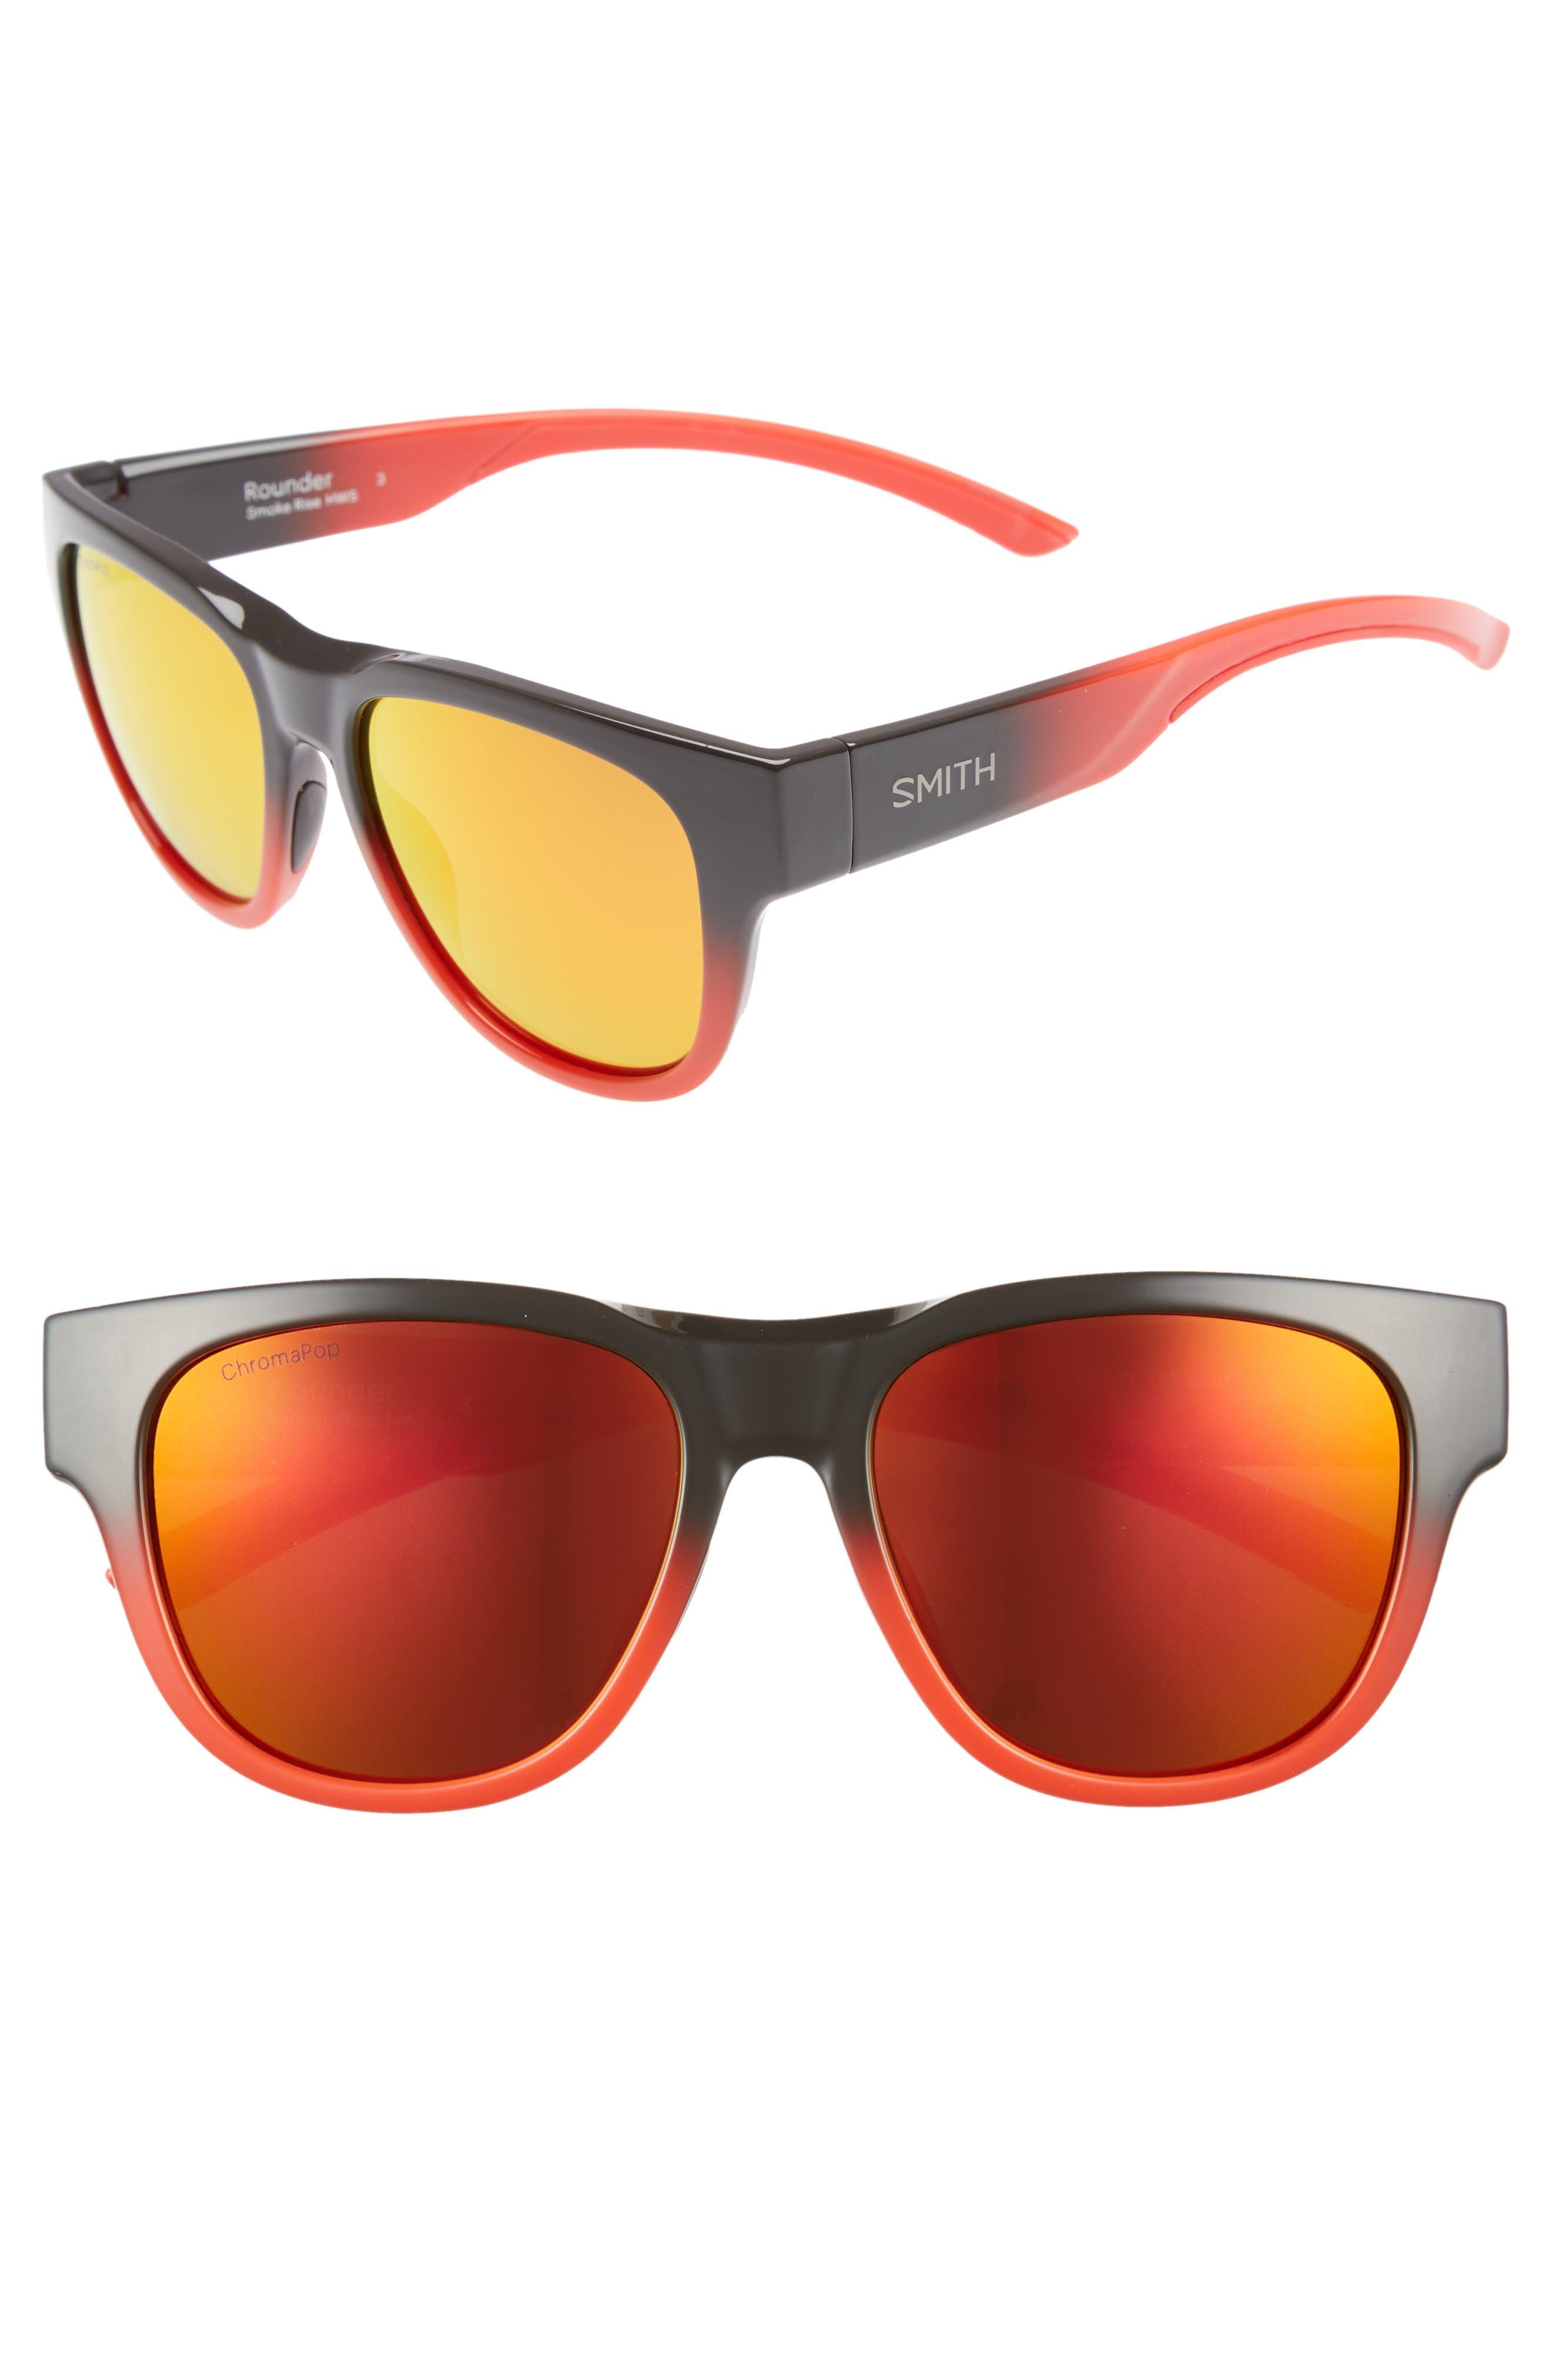 Smith Rounder 52mm ChromaPop™ Polarized Sunglasses